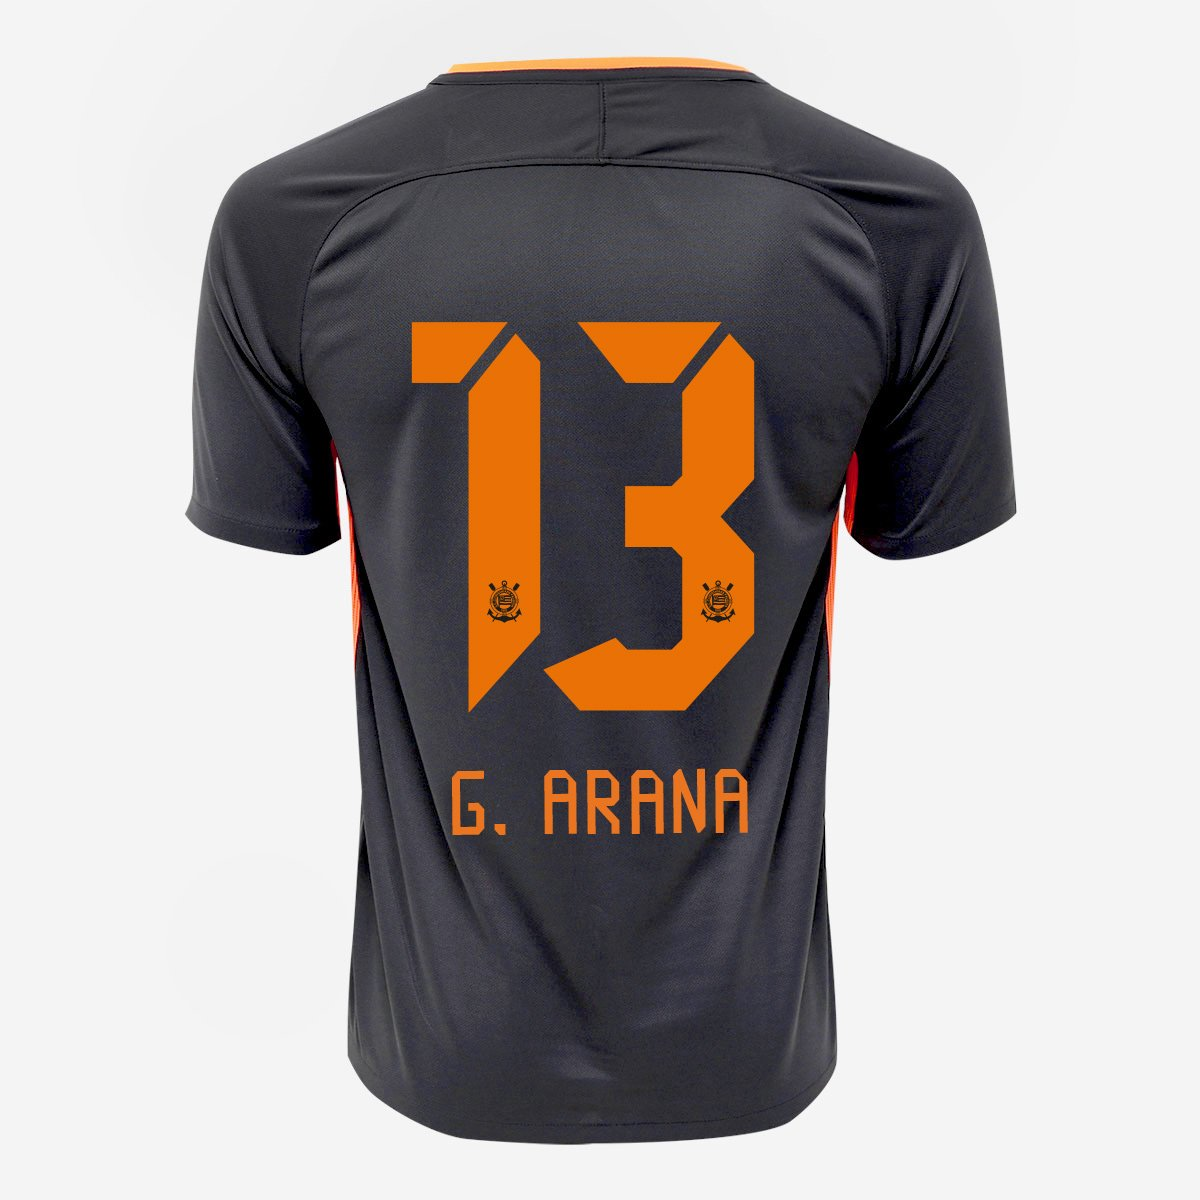 Camisa Corinthians III 17 18 nº 13 - G. Arana Torcedor Nike Masculina -  Compre Agora  b582e78469727